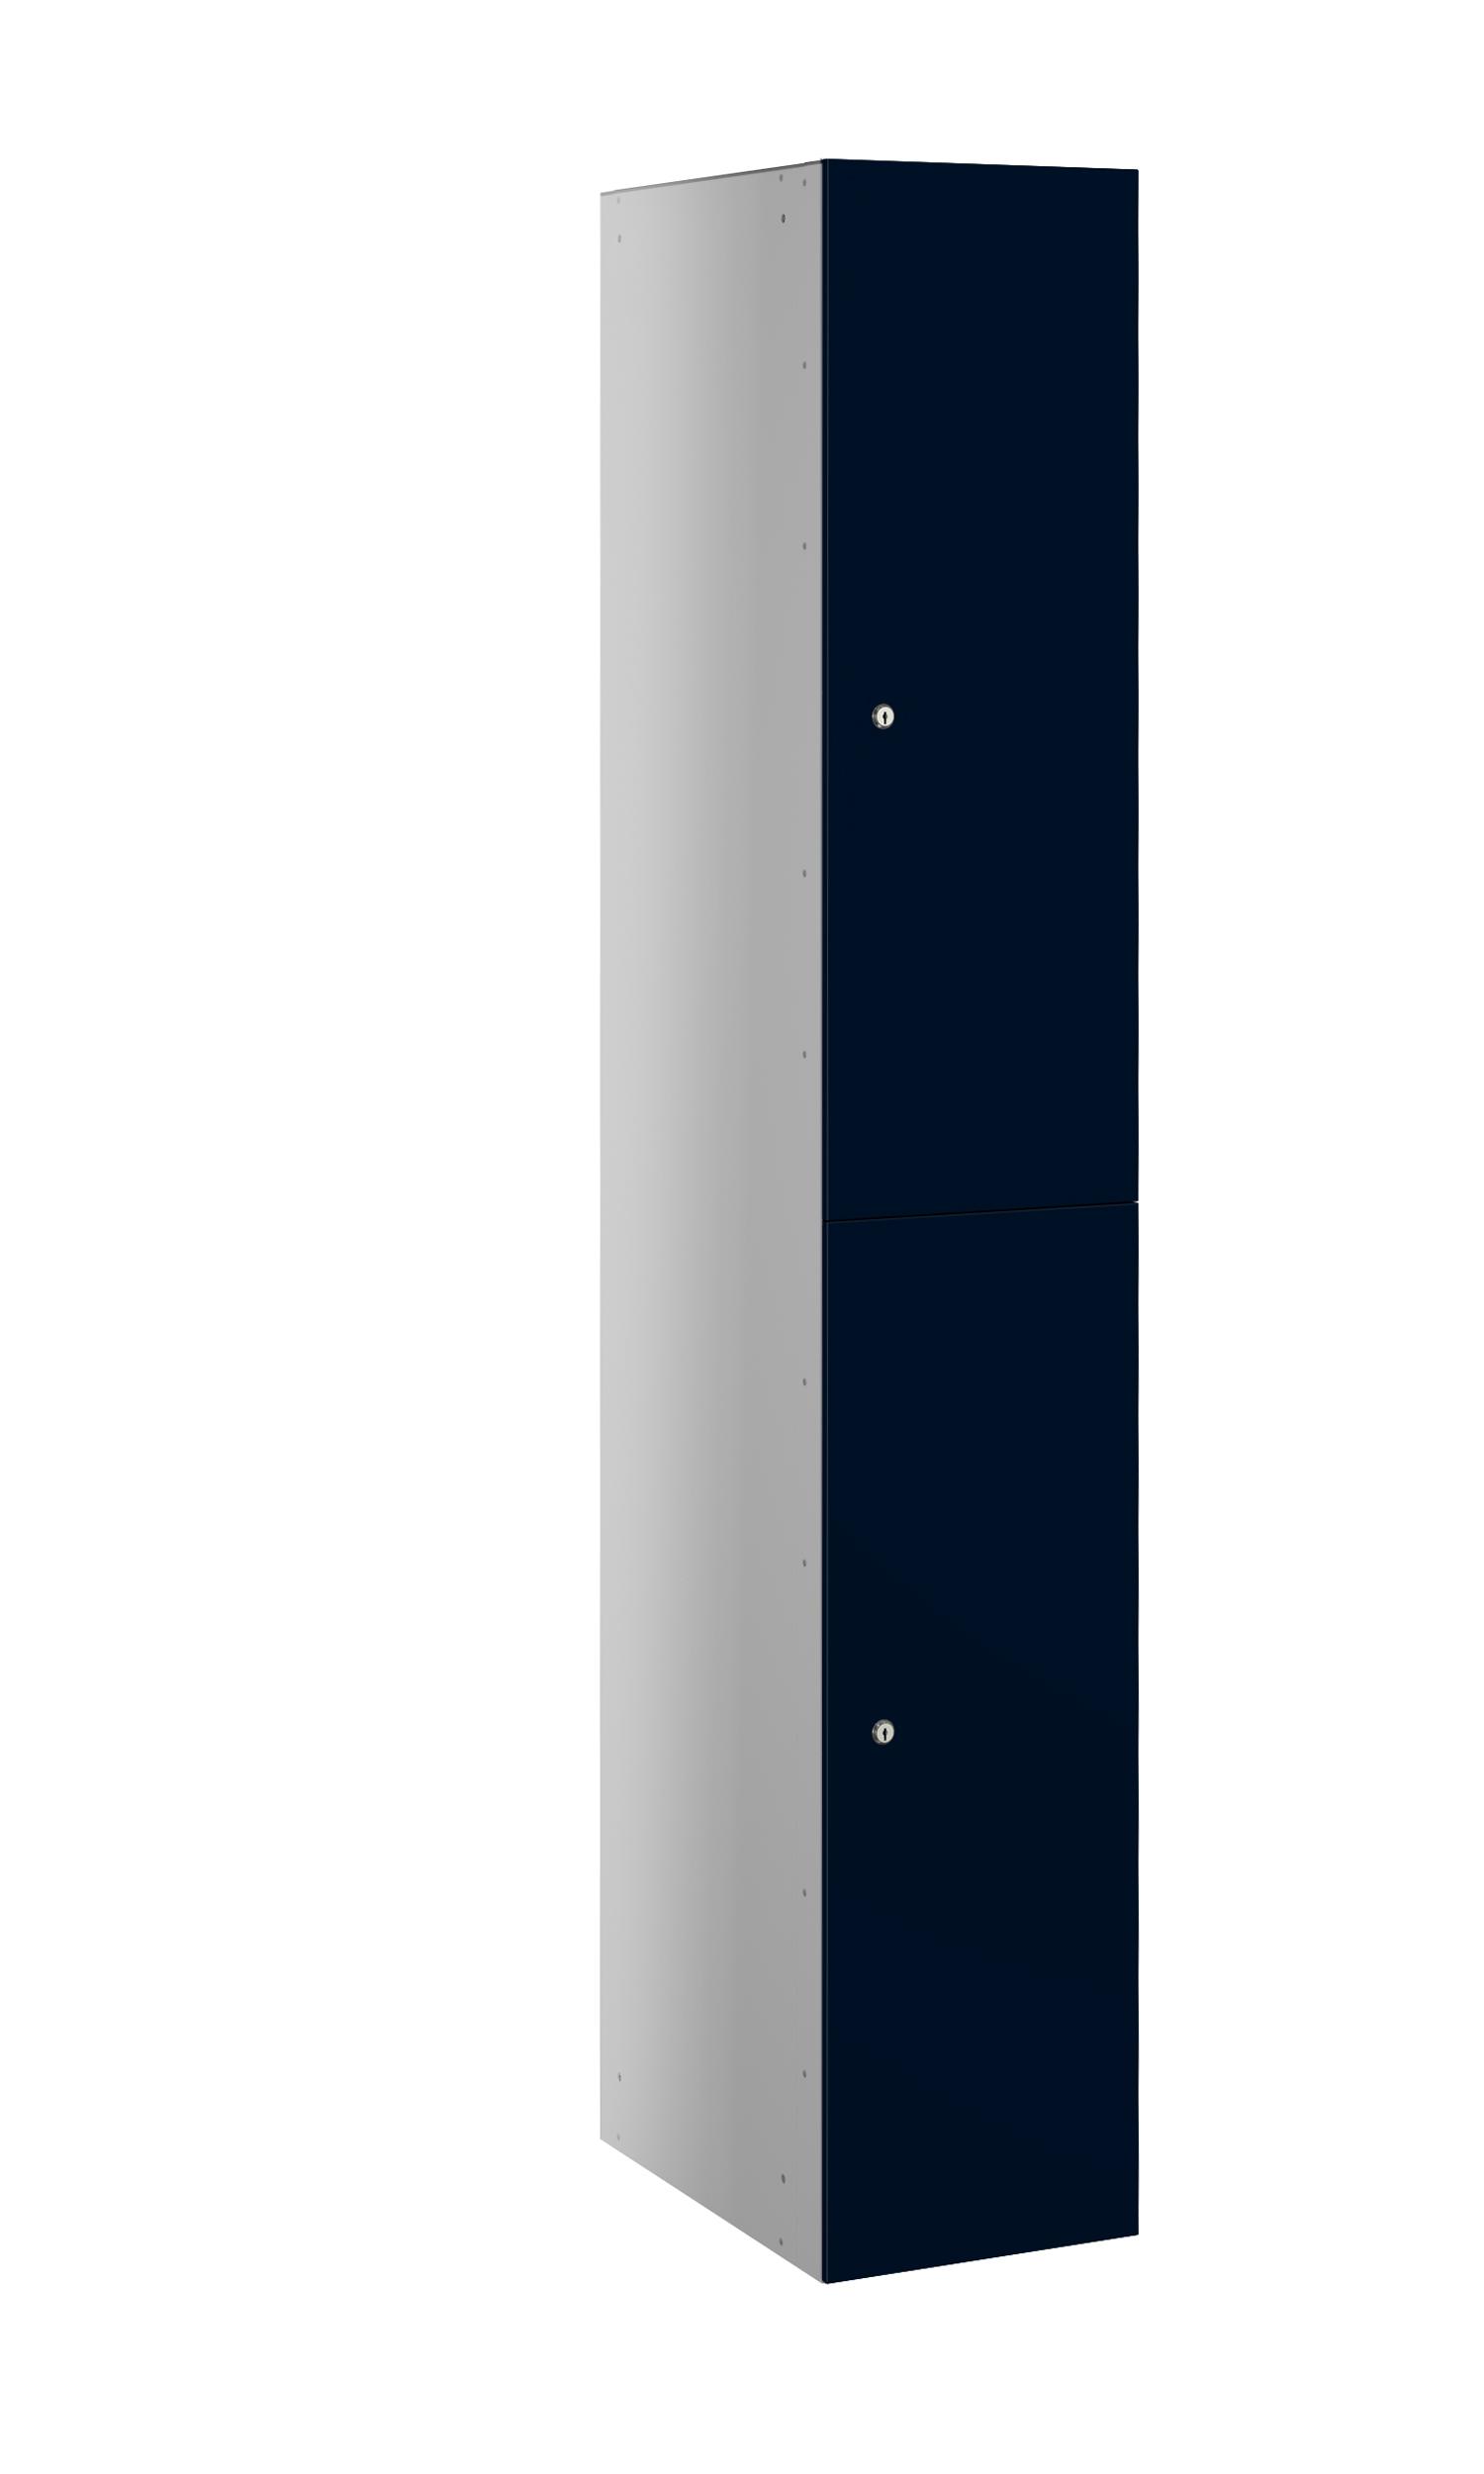 Probe buzzbox laminate 2 doors blue